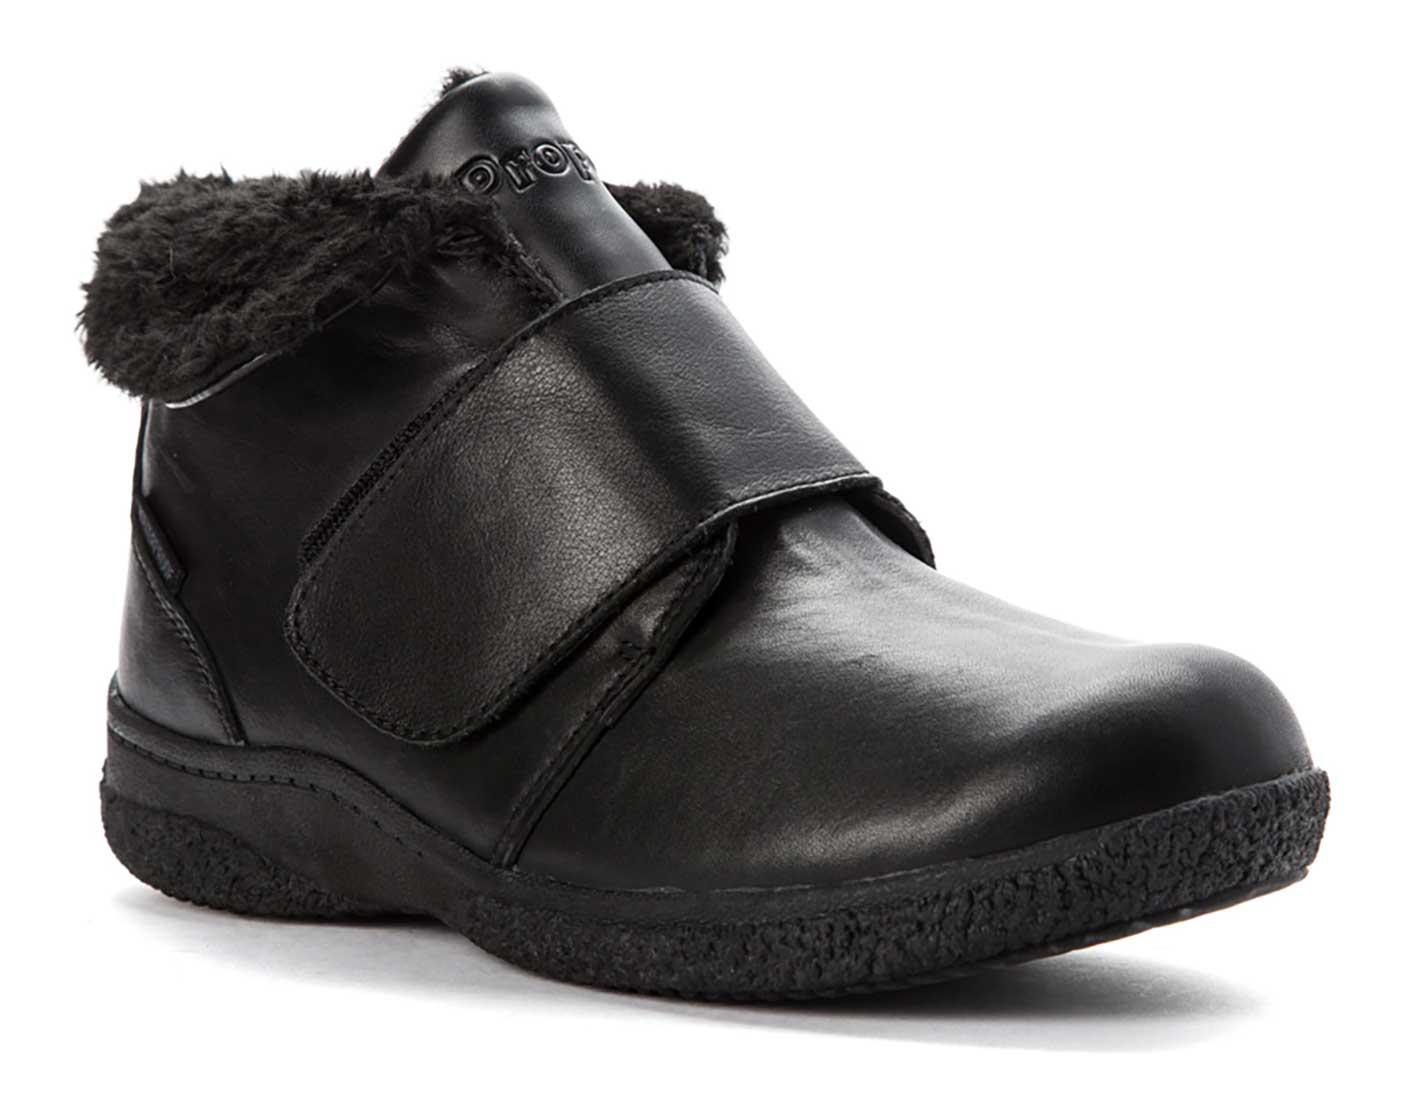 Dr A-B Comfort Cara Womens Chukka Boot: Brown 10 Medium Lace Up